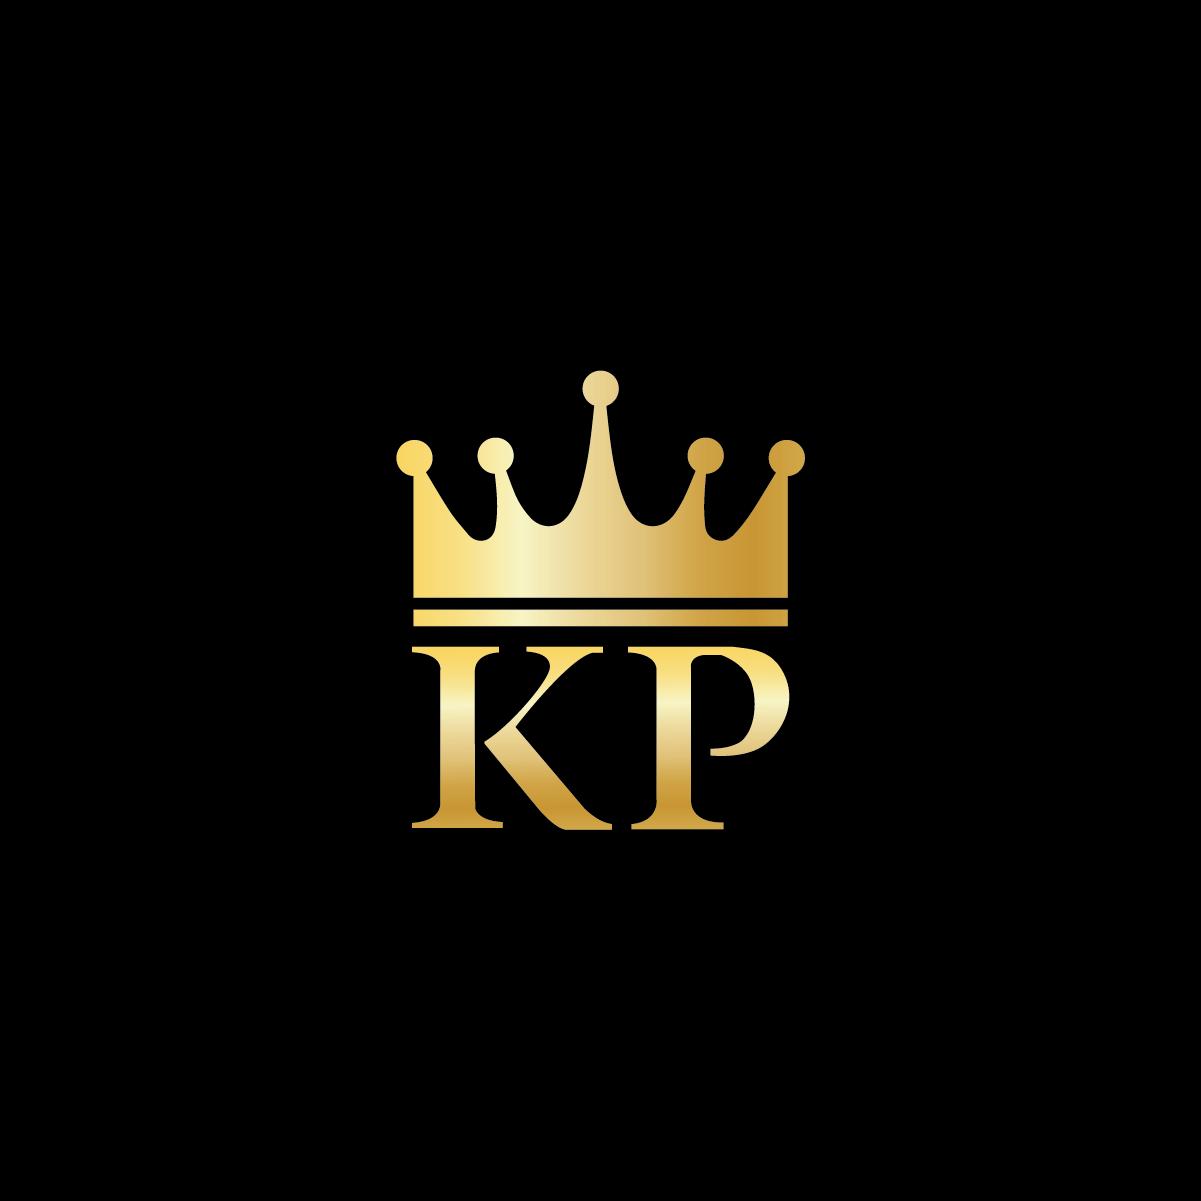 Elegant, Professional, Royal Logo Design for King Palms by.